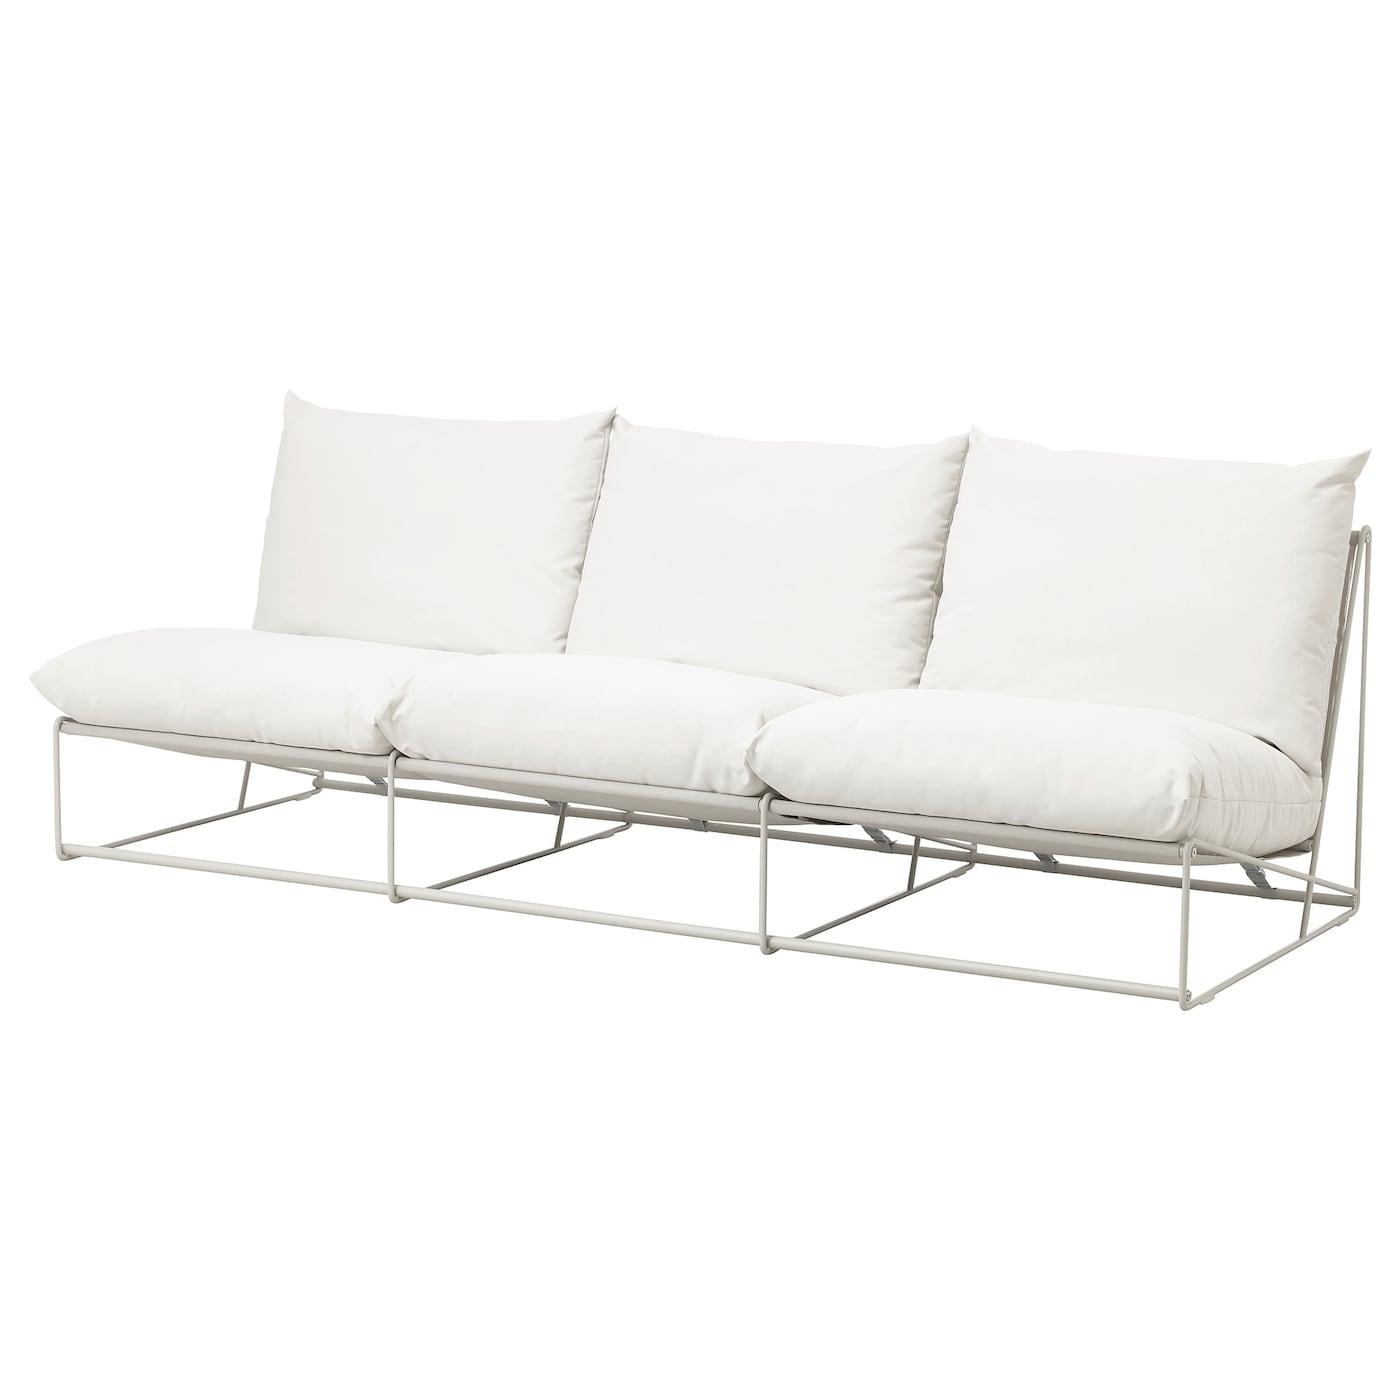 sand aluminium loungem bel garten online kaufen m bel. Black Bedroom Furniture Sets. Home Design Ideas